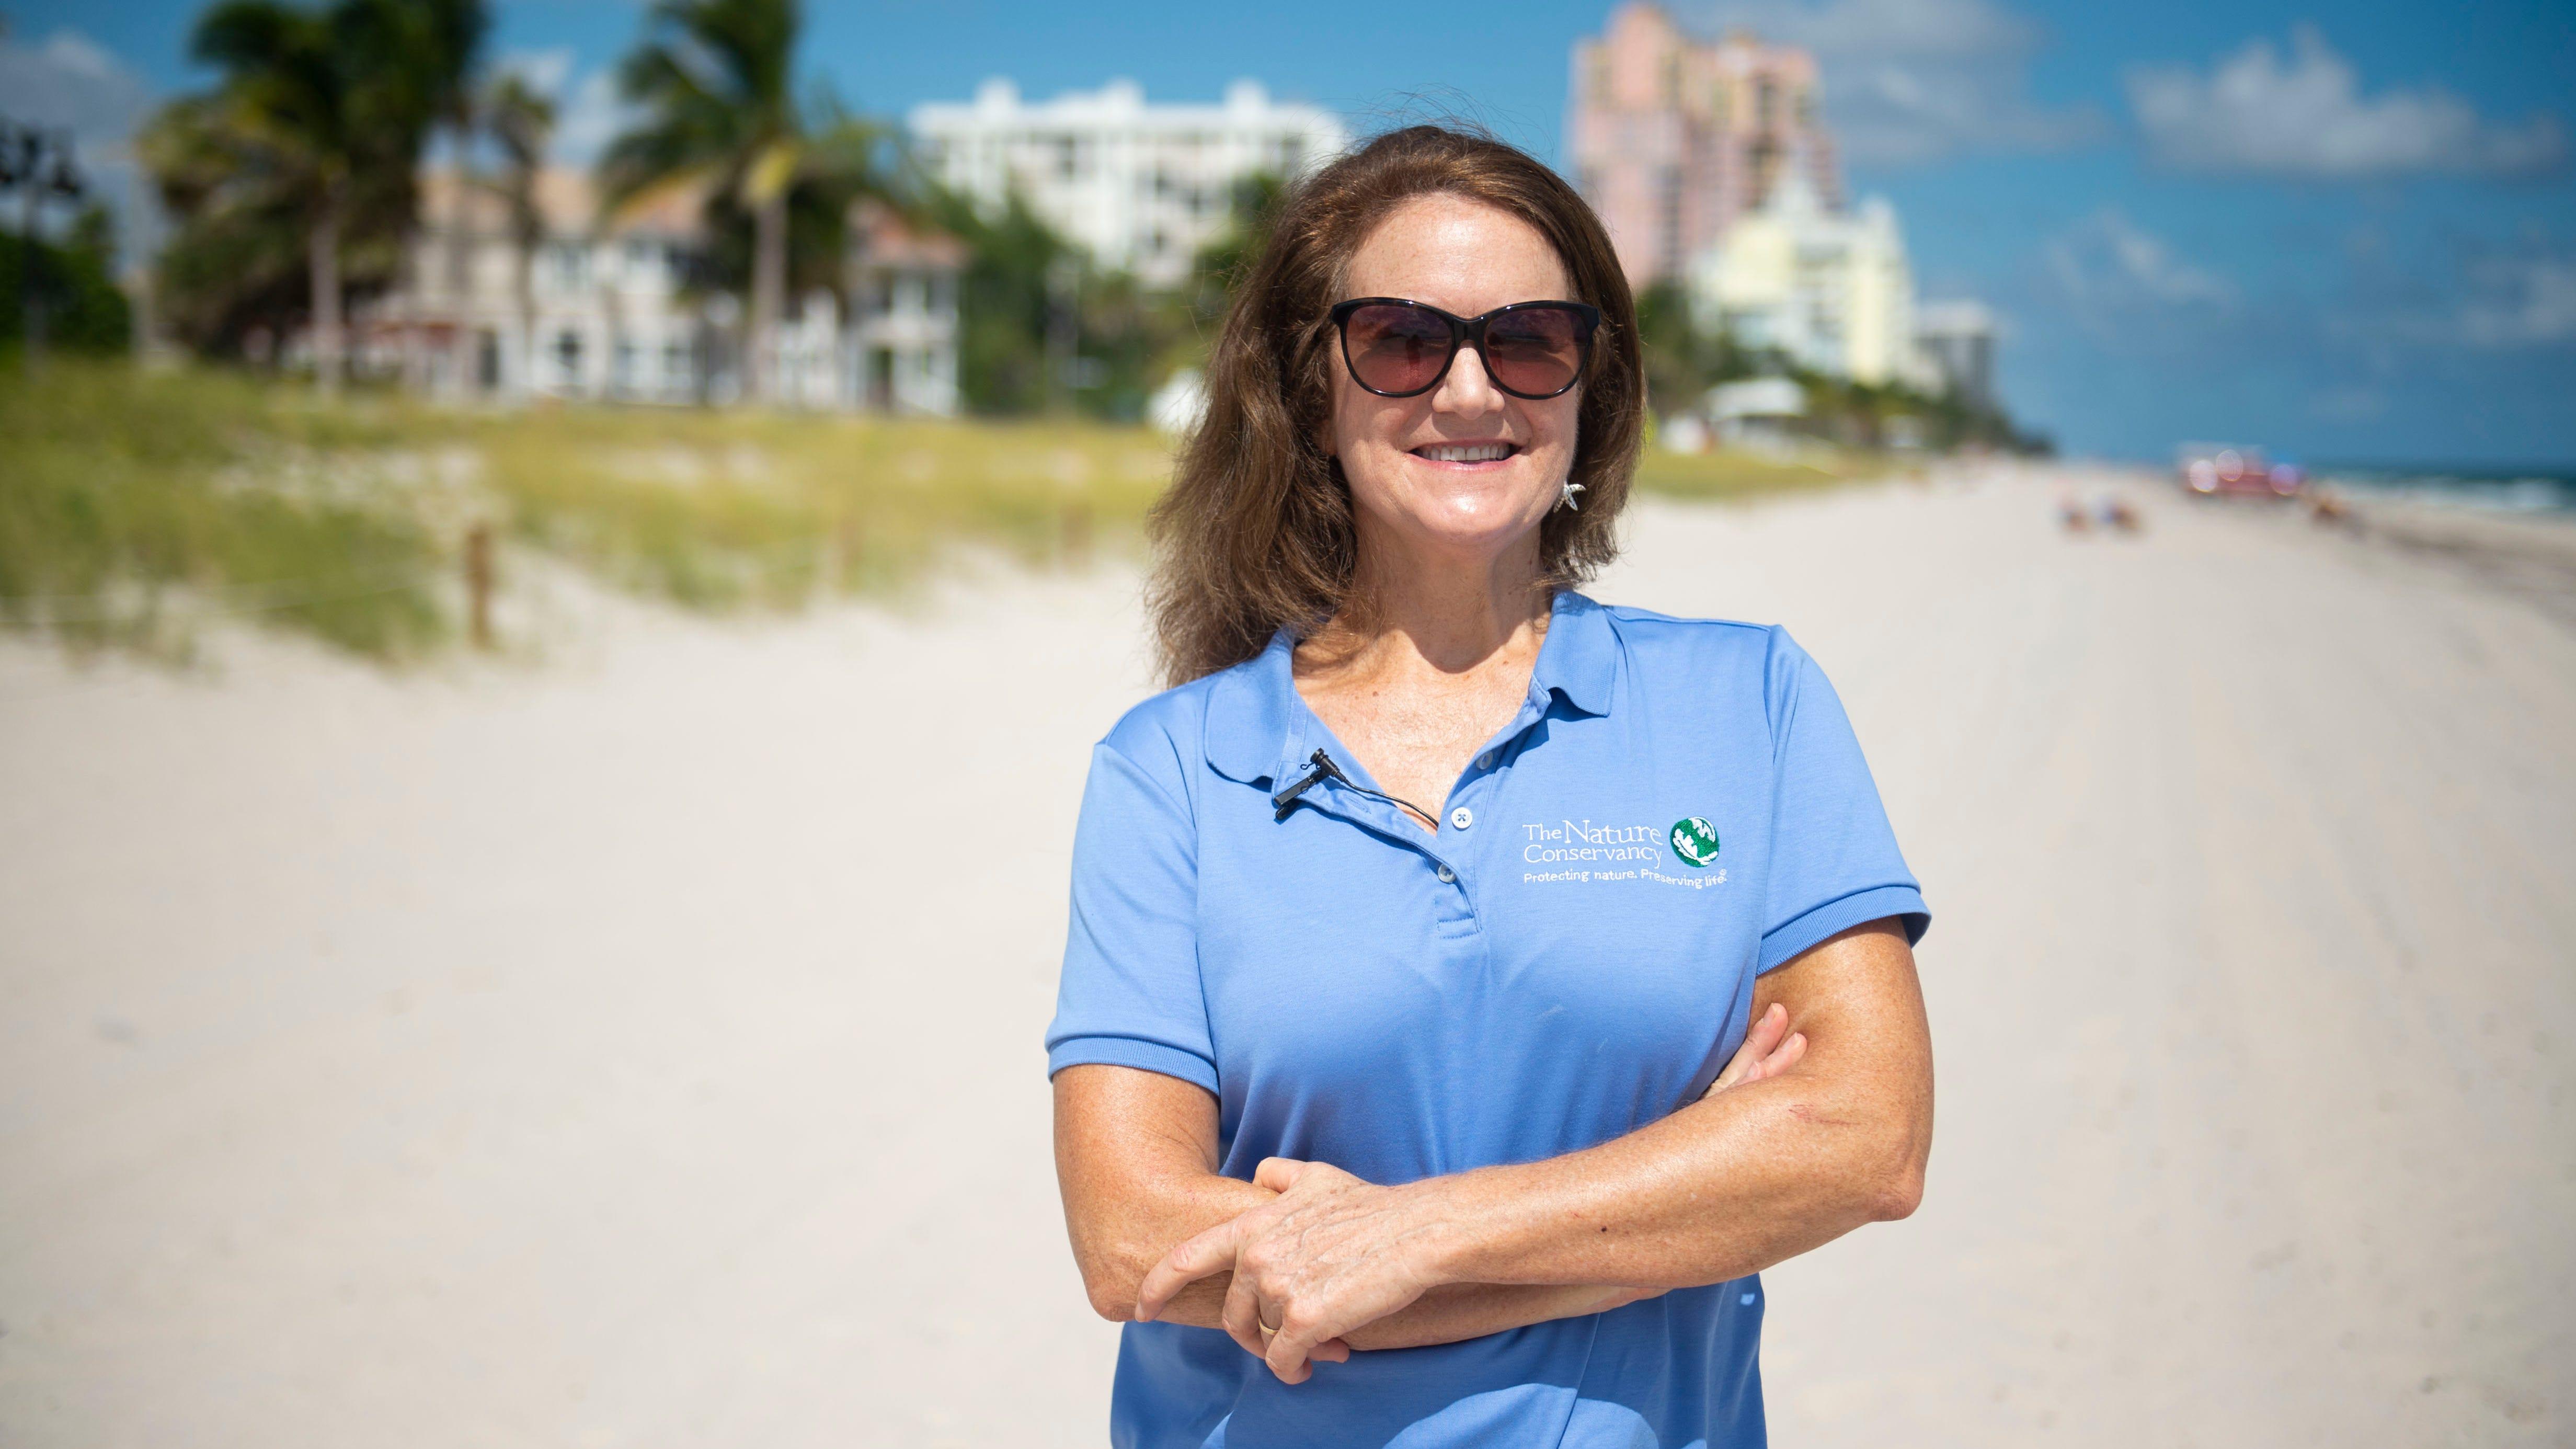 Florida faces 'existential' decision about climate change